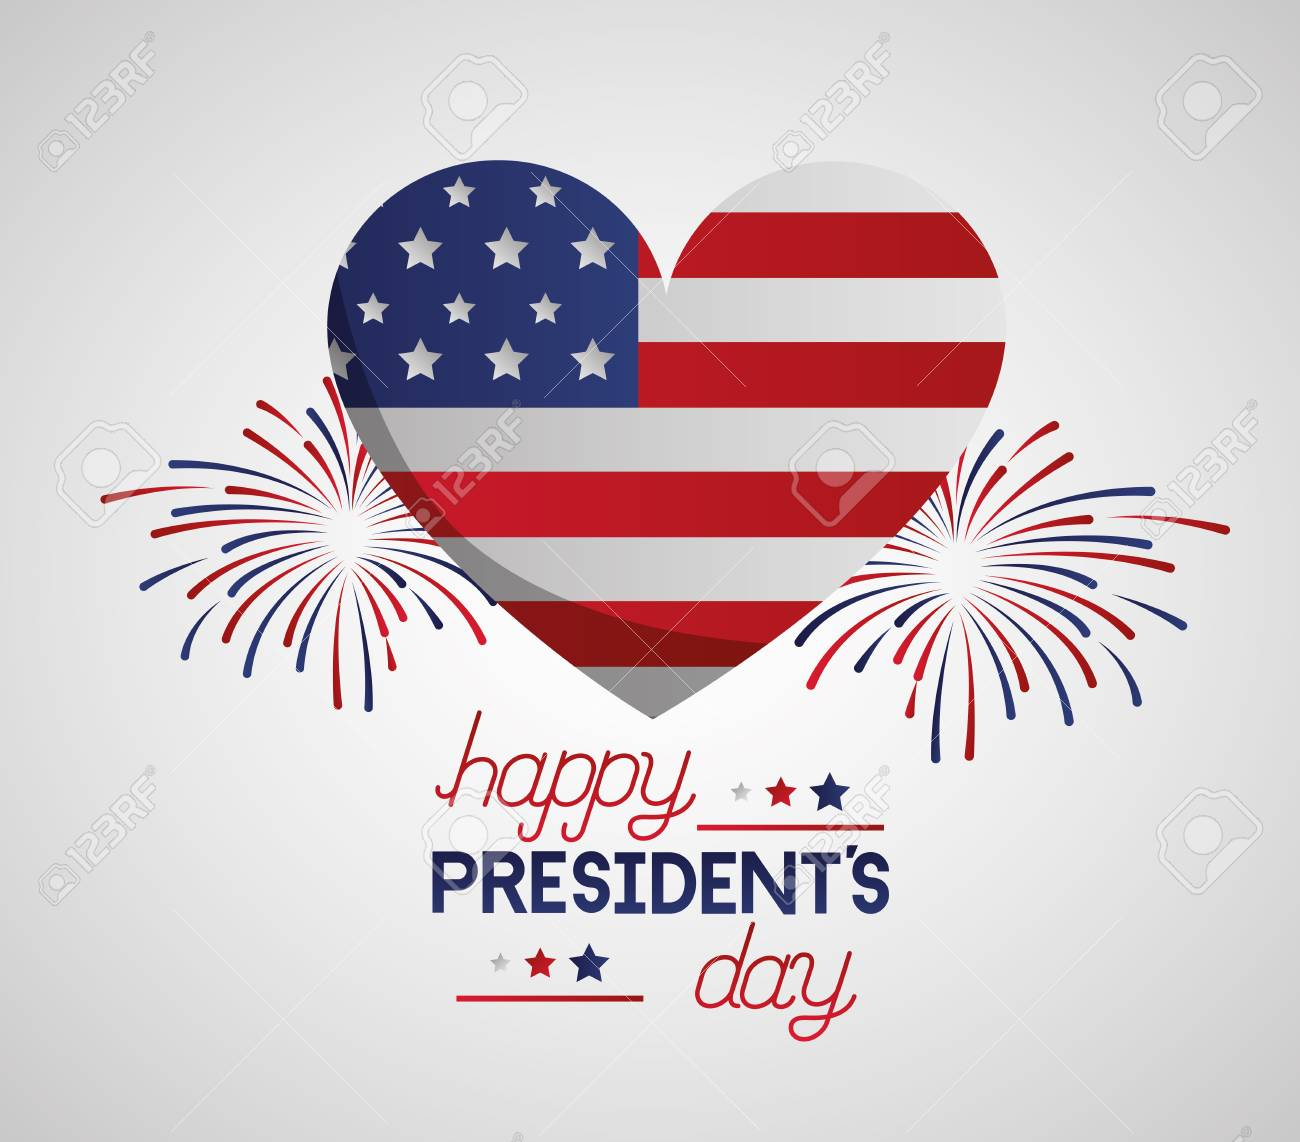 heart american flag fireworks happy presidents day vector illustration - 125979395